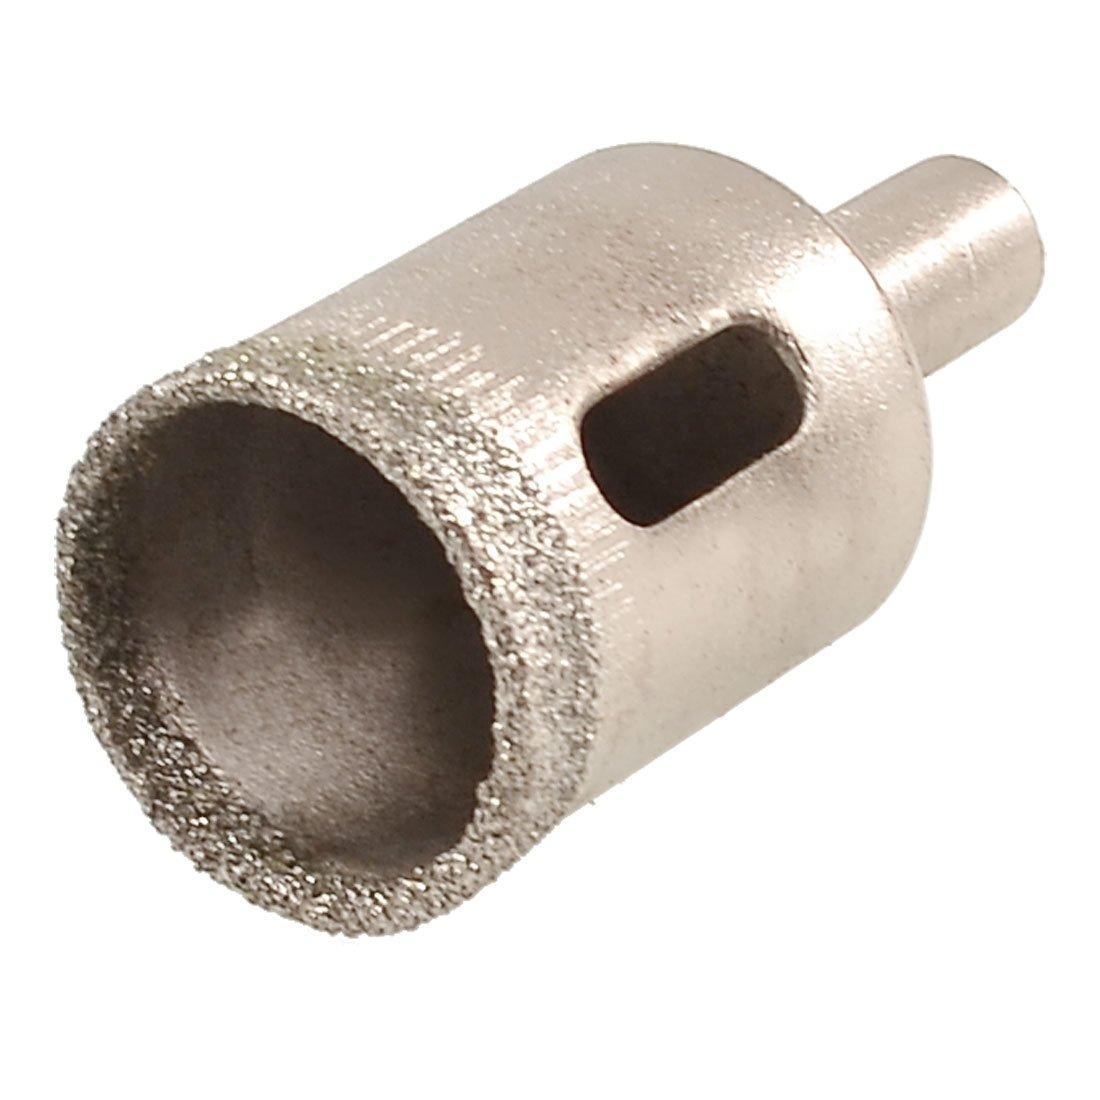 WSFS Hot 20mm Diamond Tipped Drill Bit Ceramic Tile Glass Hole Saw(China (Mainland))